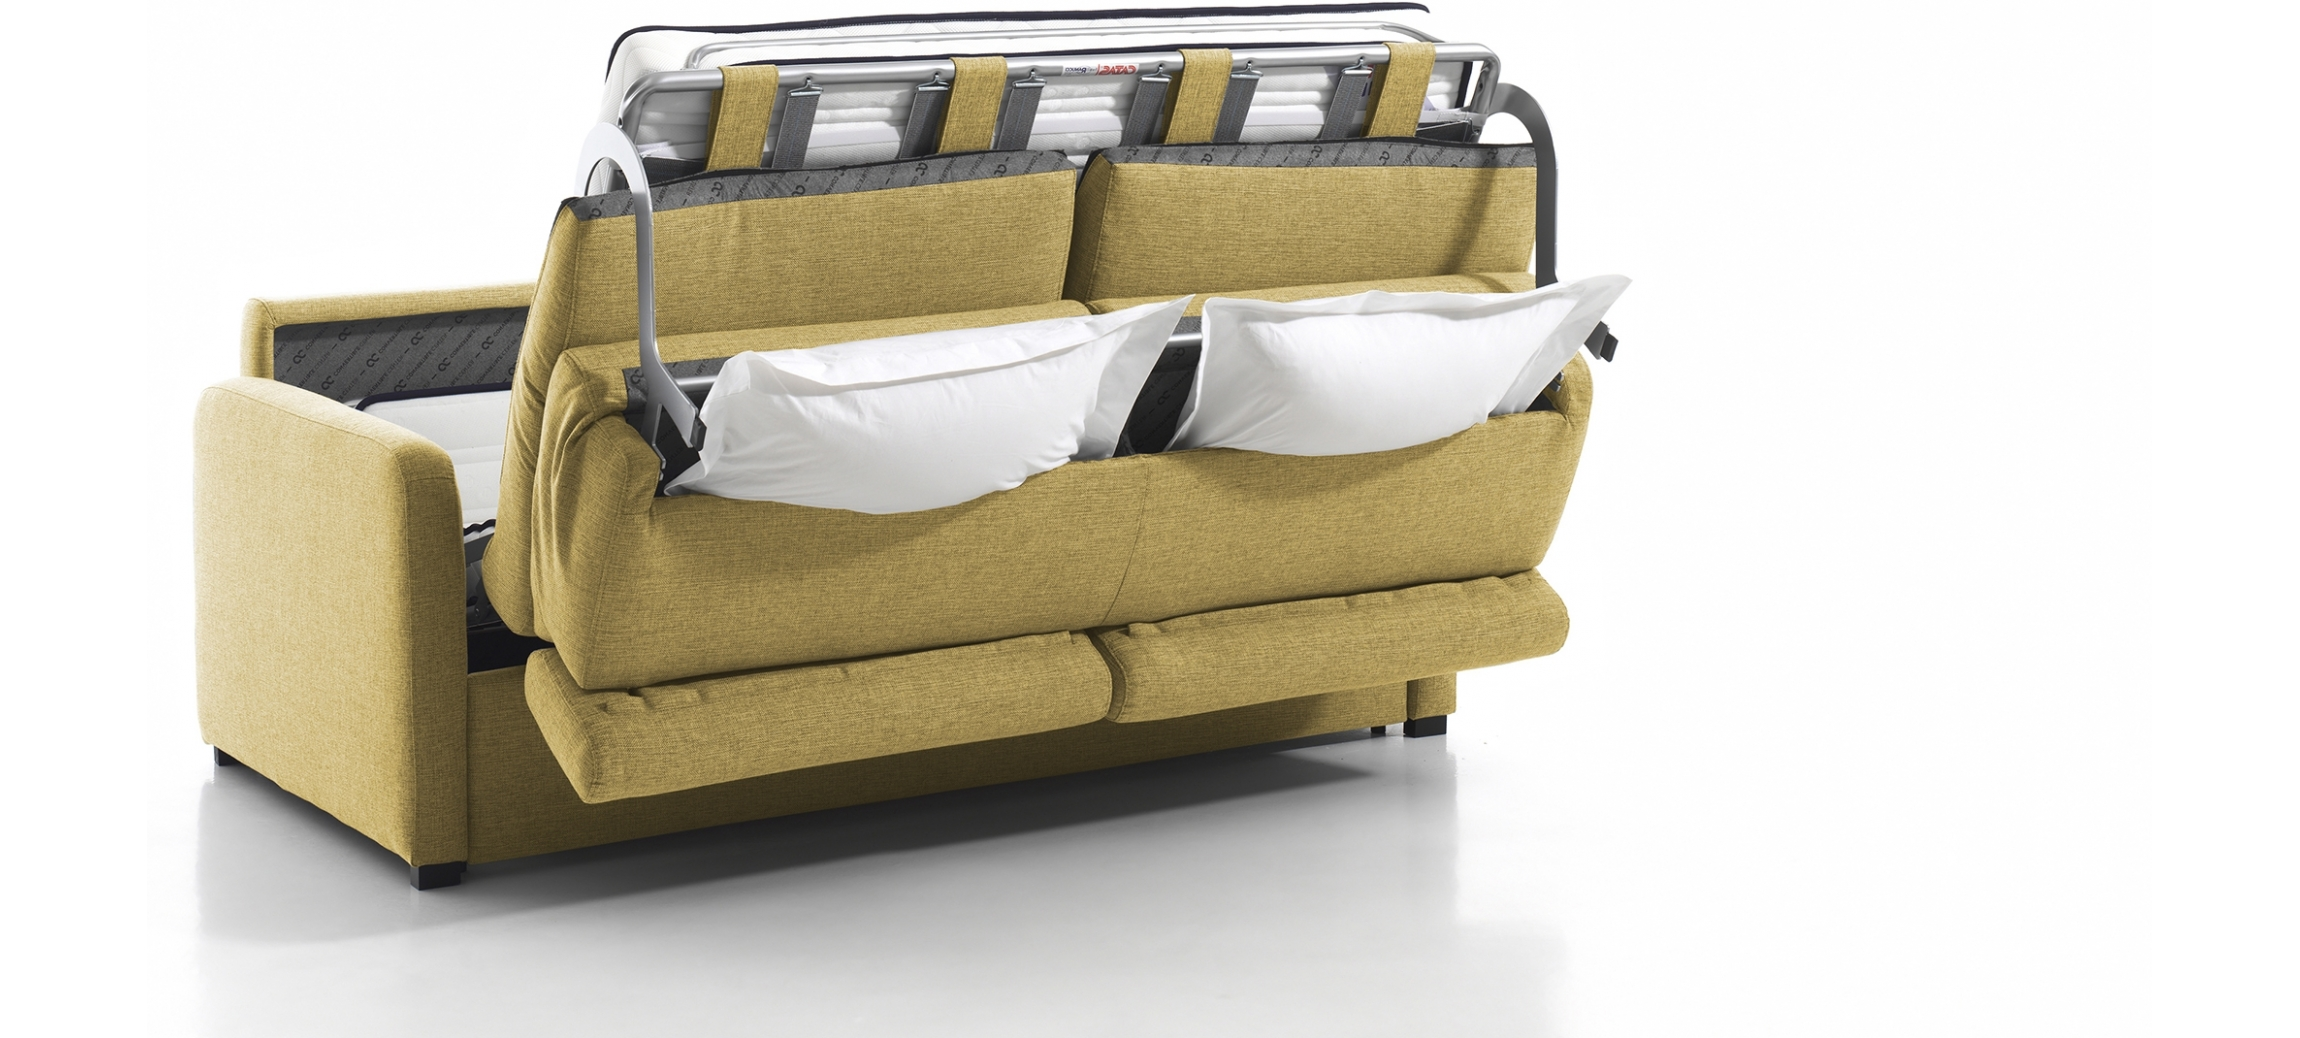 canap 4 places convertible forli avec matelas 160cm. Black Bedroom Furniture Sets. Home Design Ideas